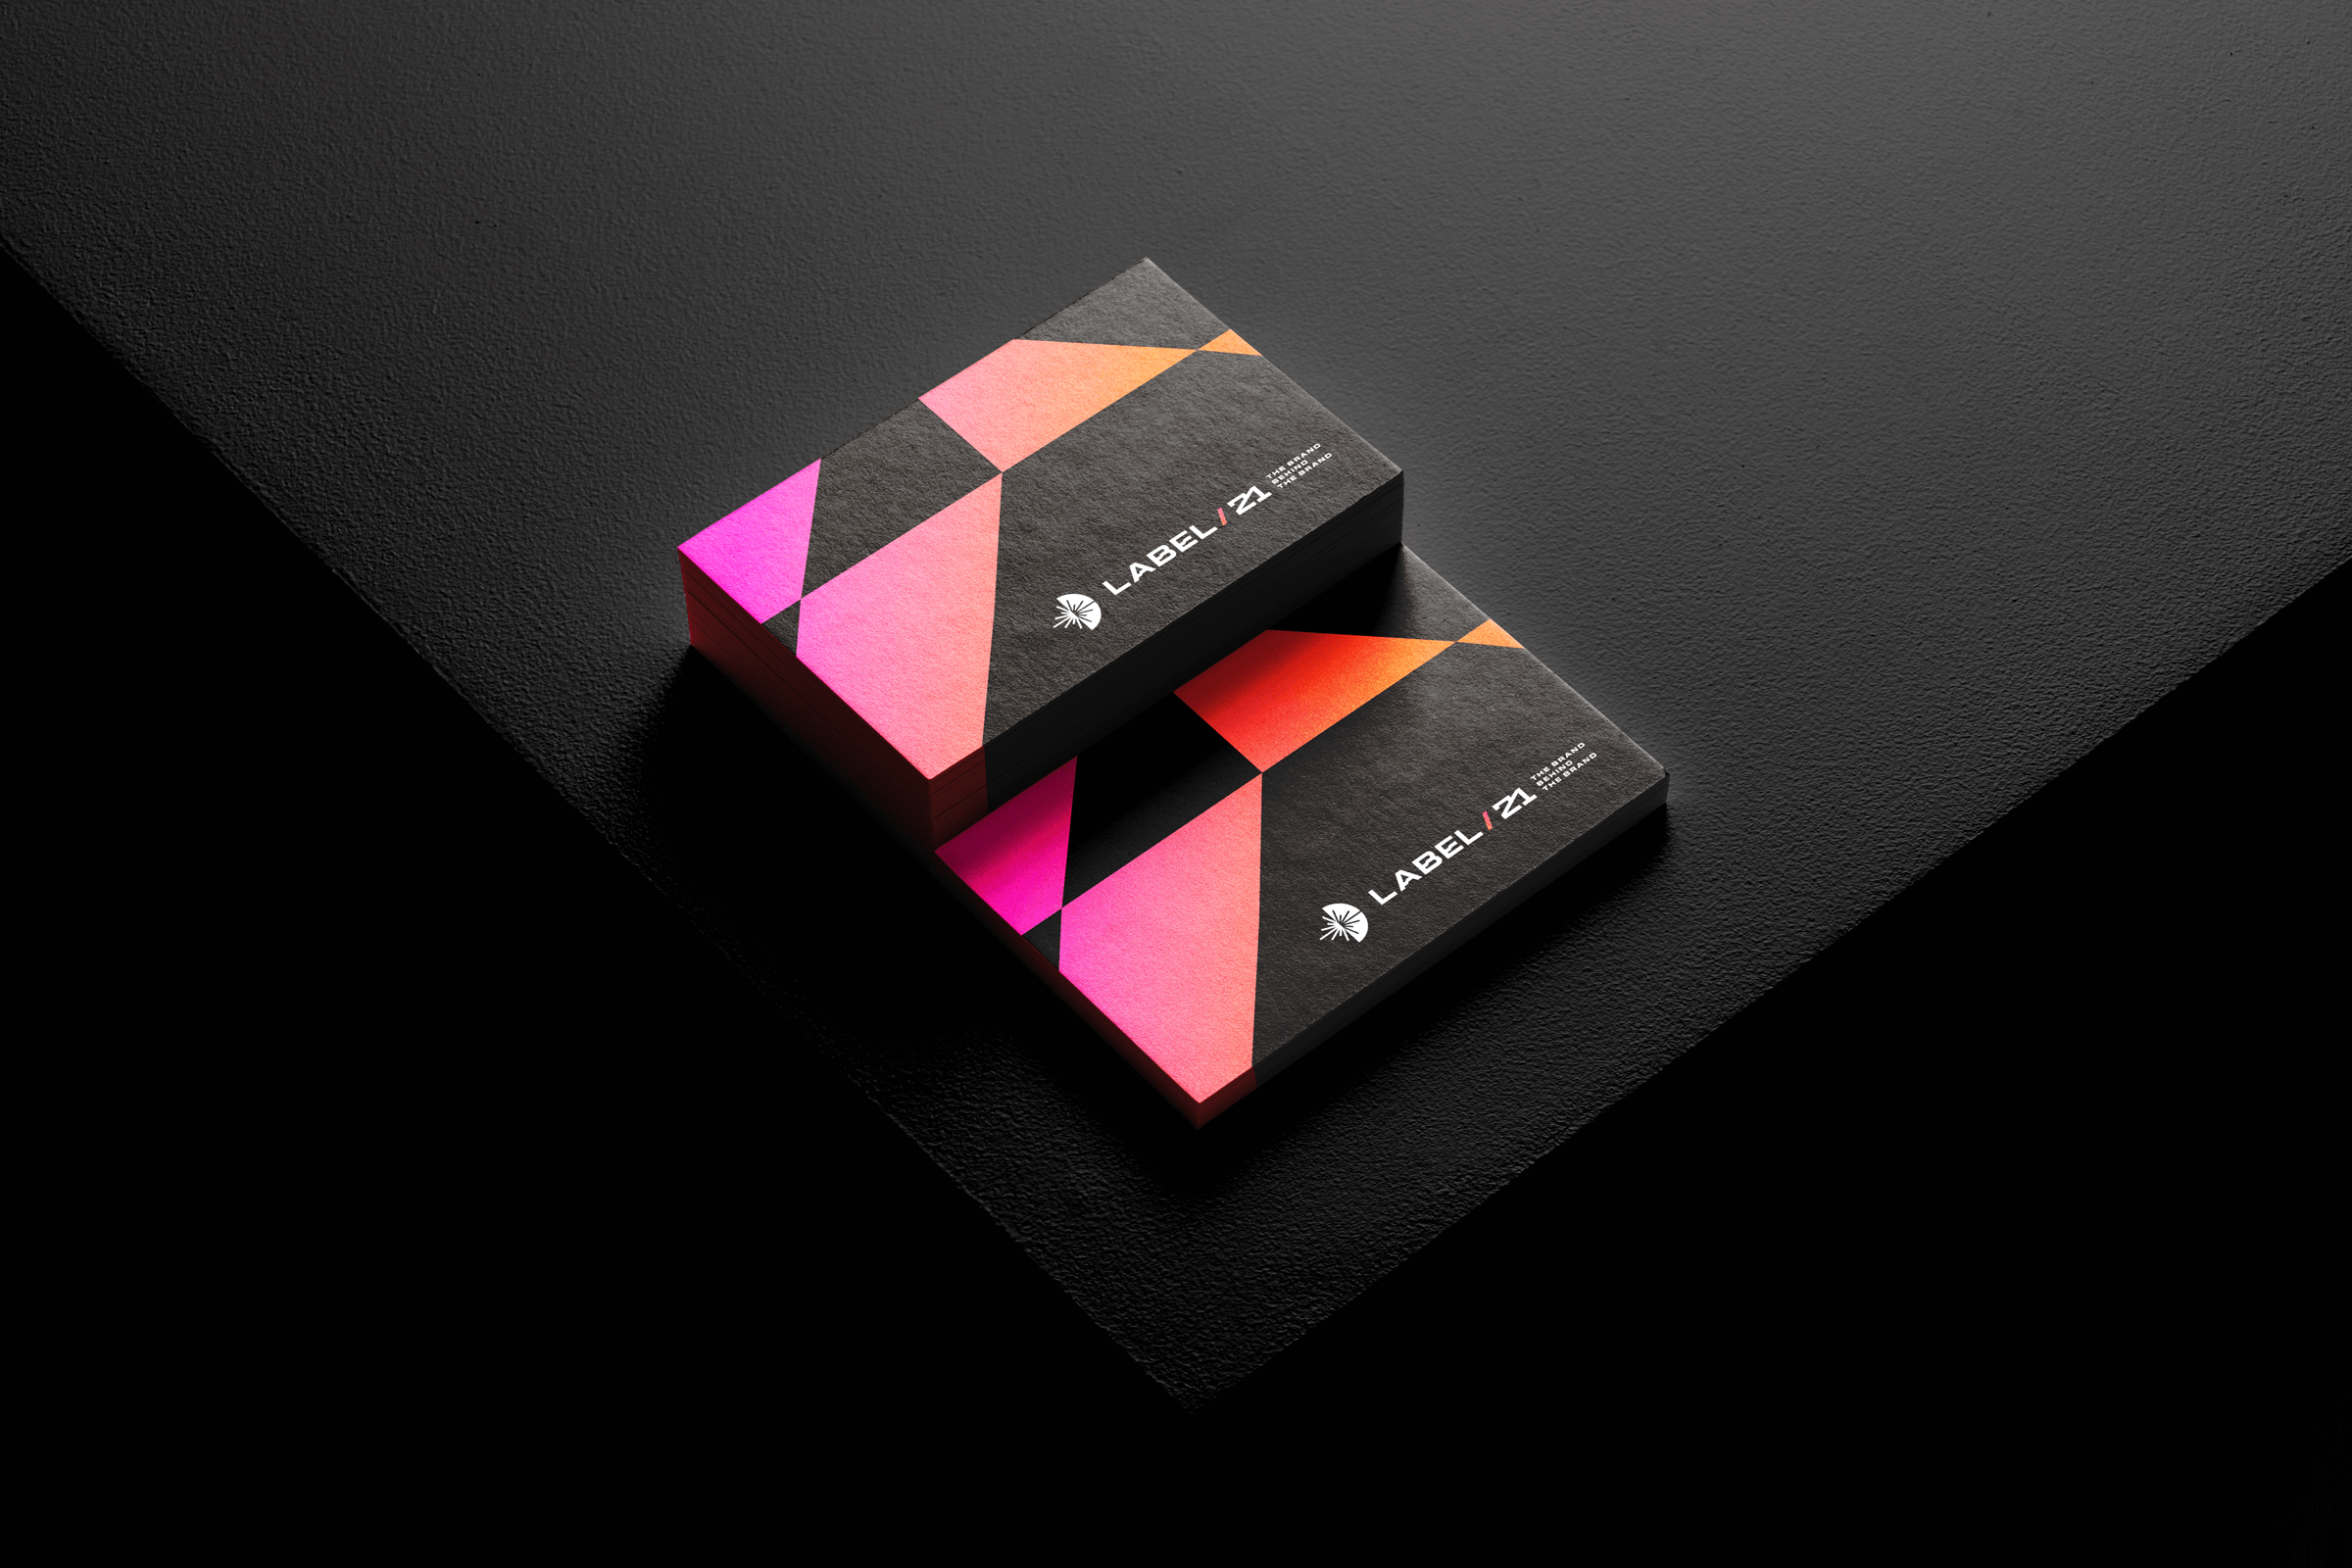 Estúdio Kuumba Creates Visual Identity Project for Label 21